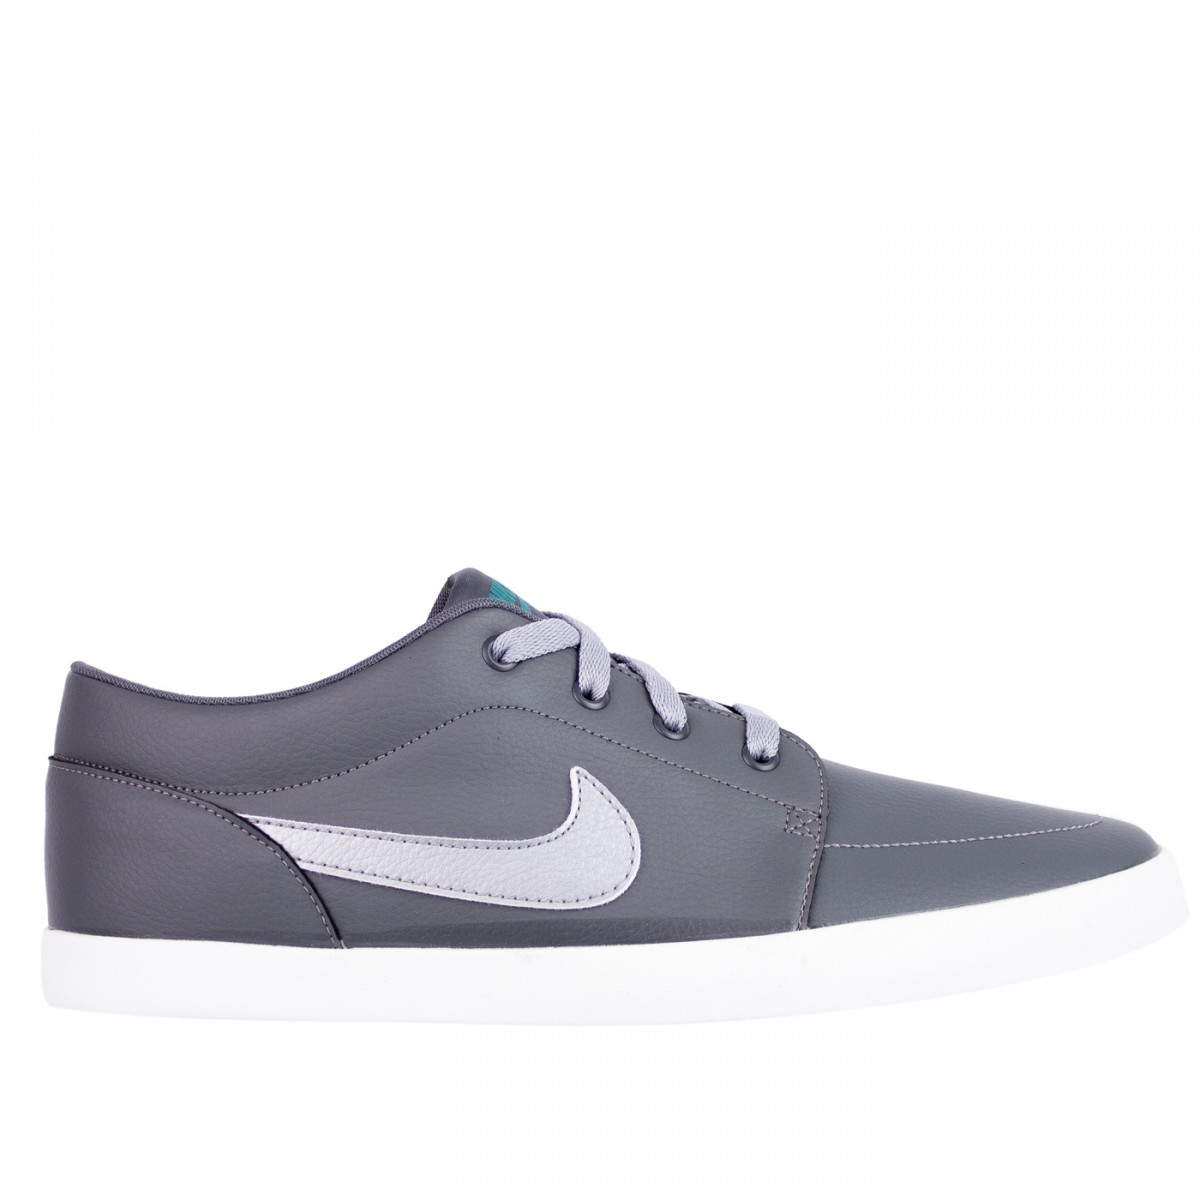 ... Bizz Store - Tênis Masculino Nike Futslide SL Preto Couro Casual  ddc42d4eddc1a7 ... 84d3964d3c0db